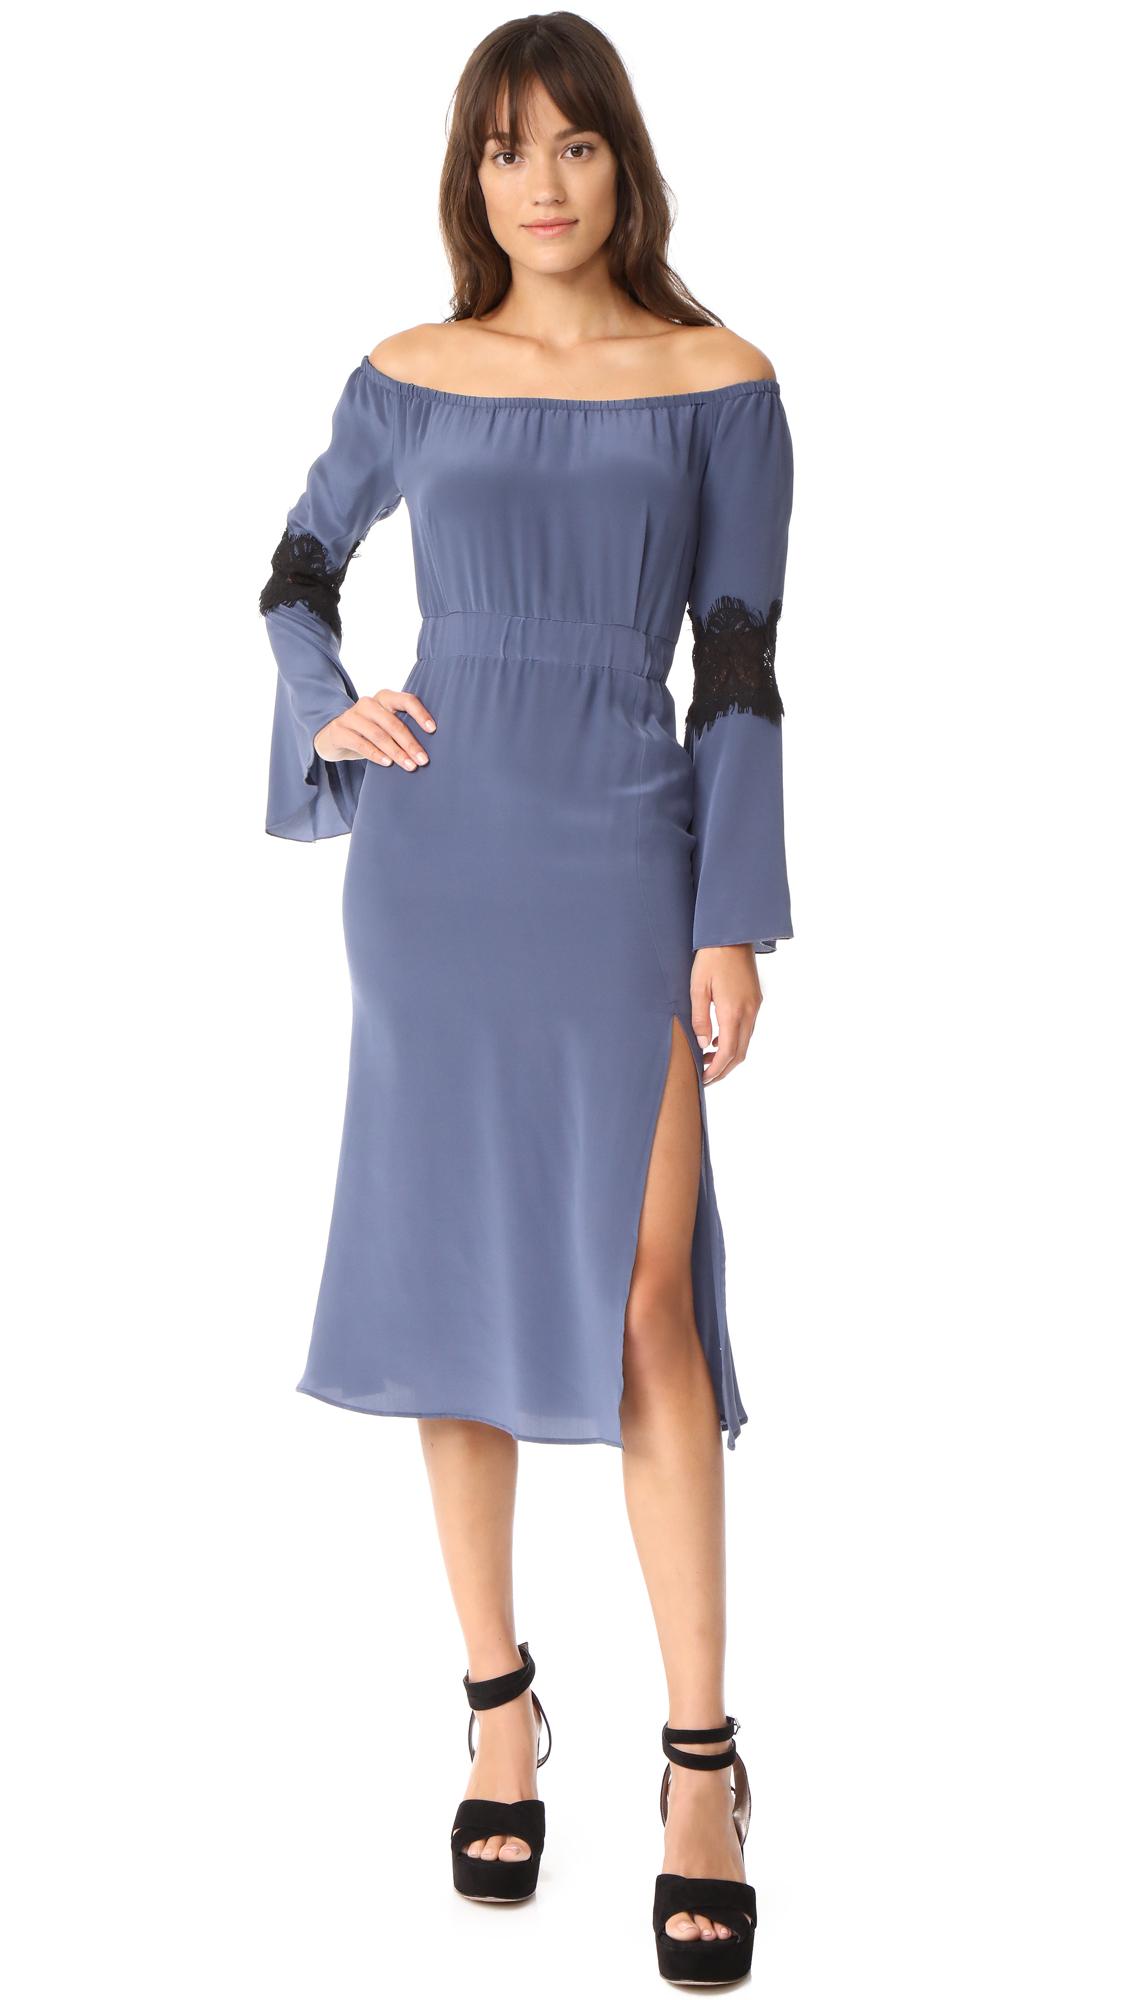 Stone Cold Fox Nicholson Dress - Steel Blue